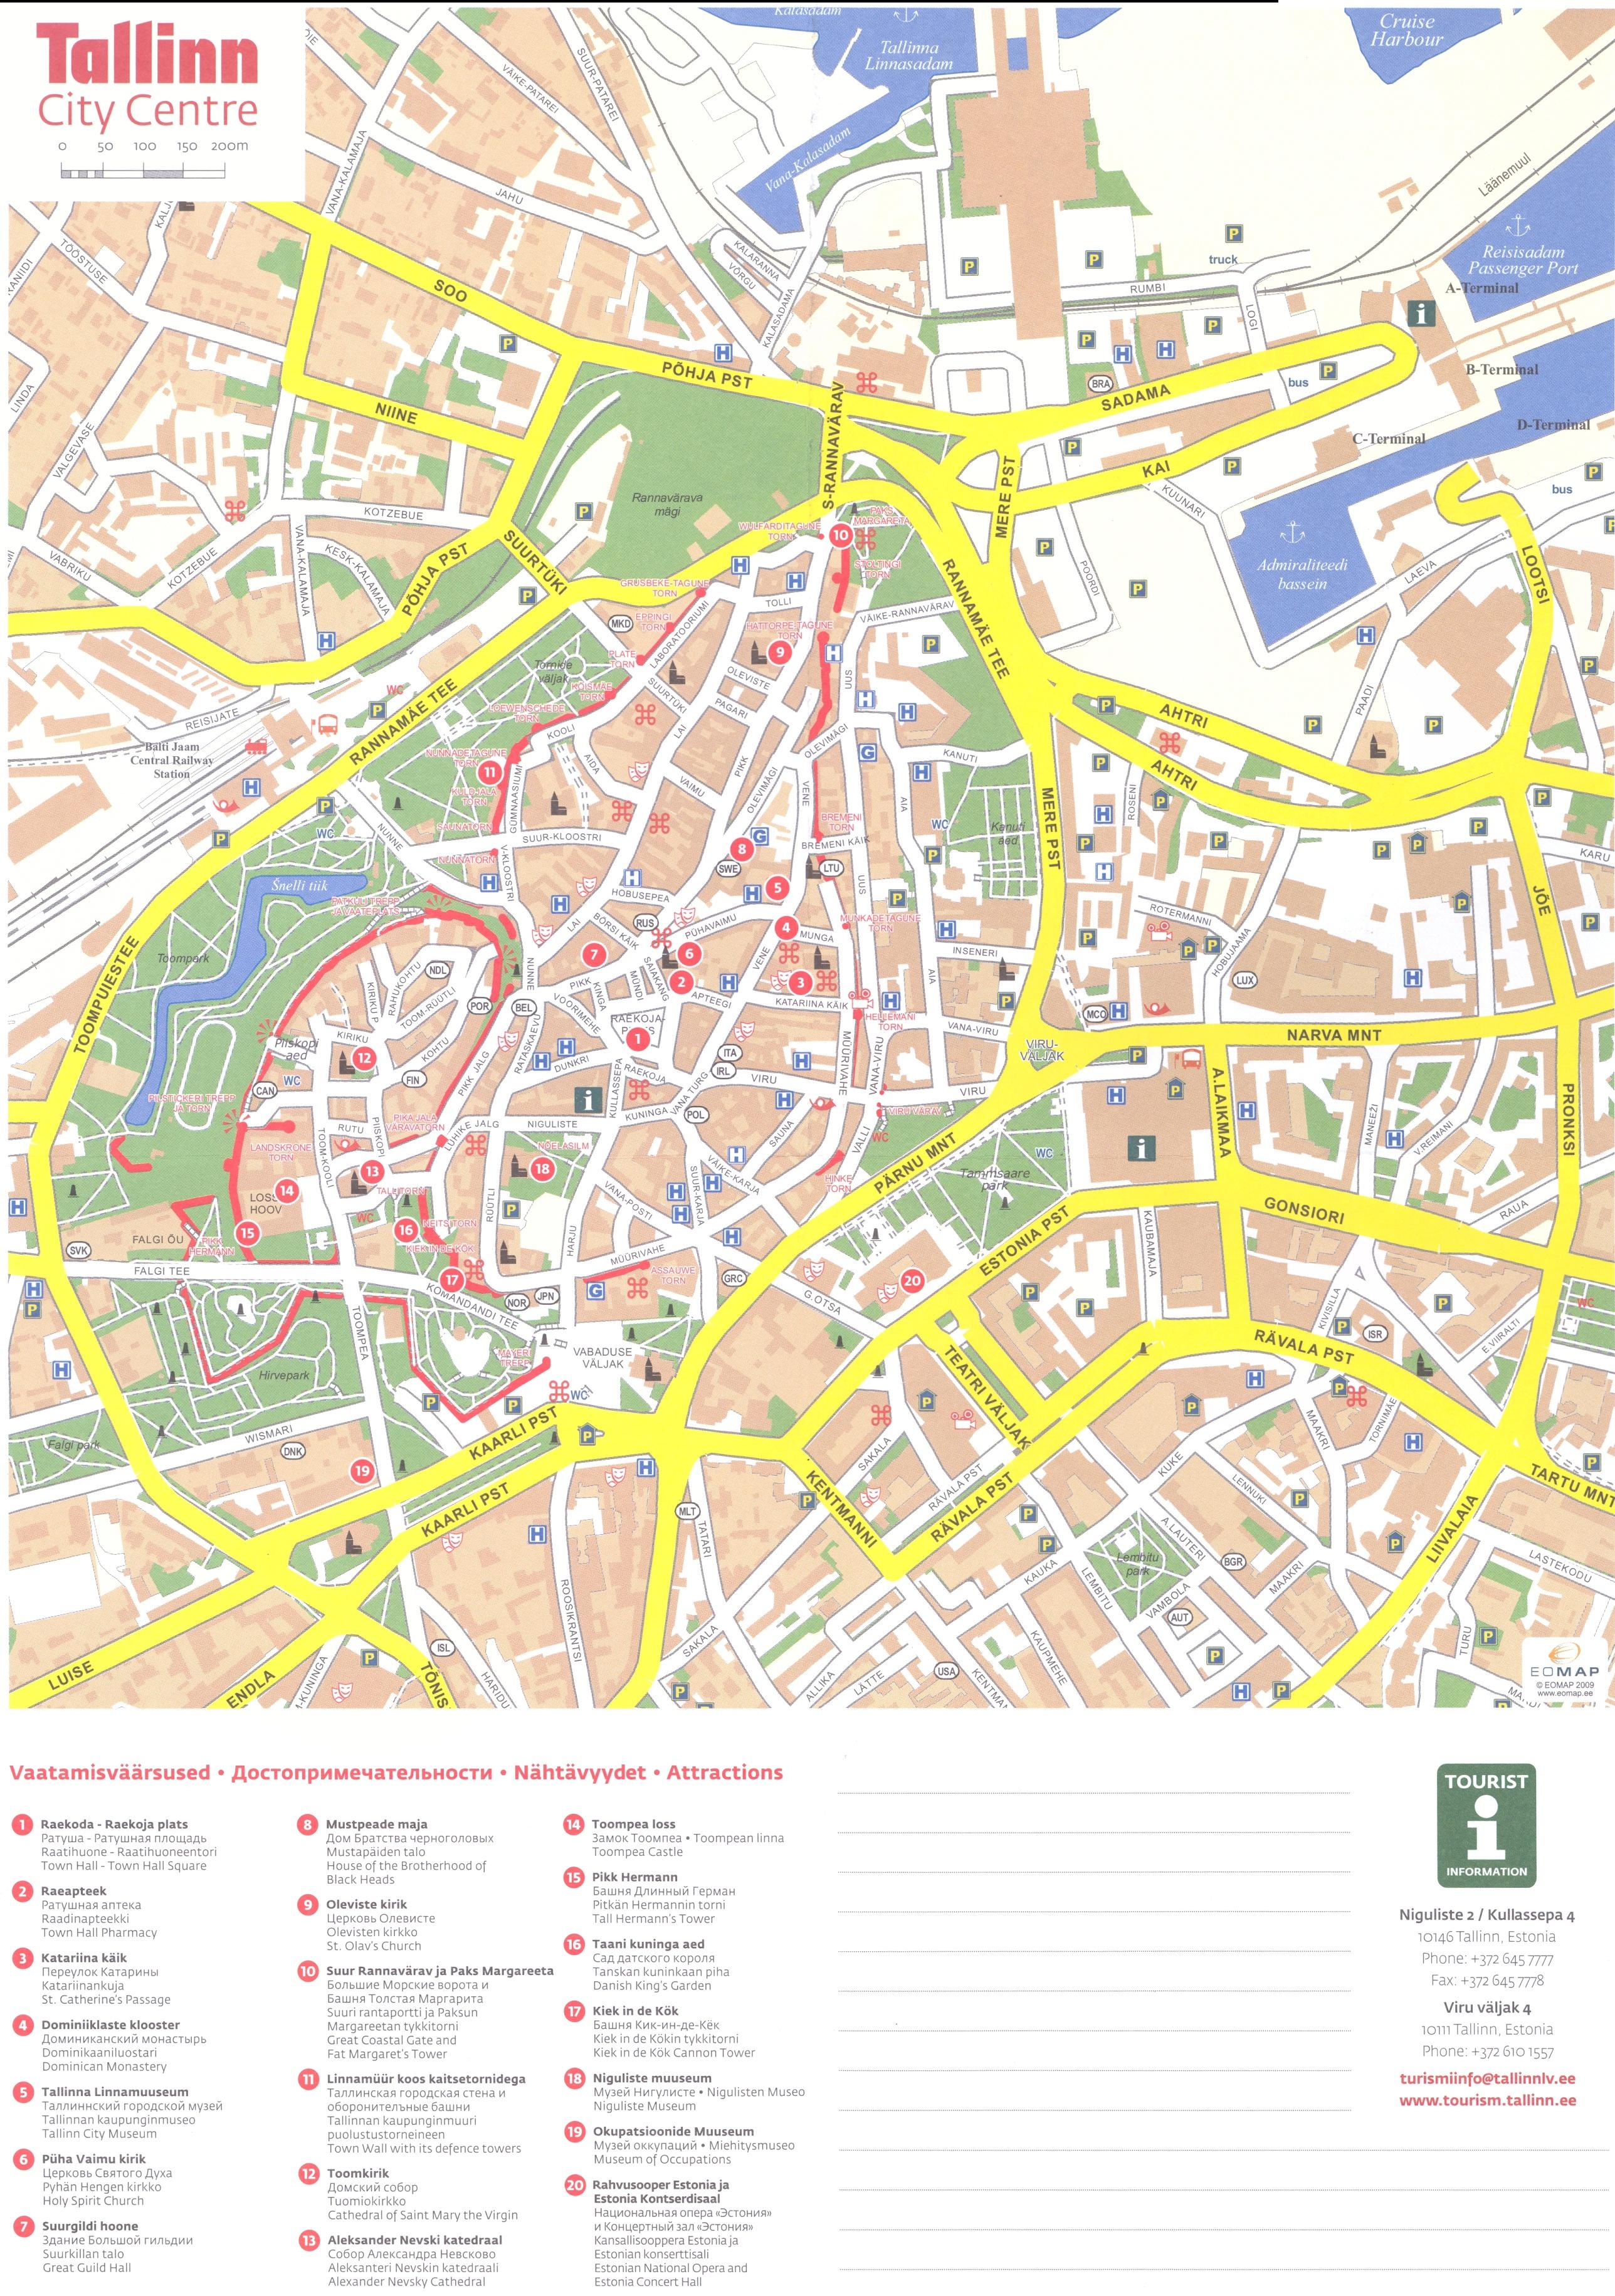 Mapa Monumentos Tallinn Estónia